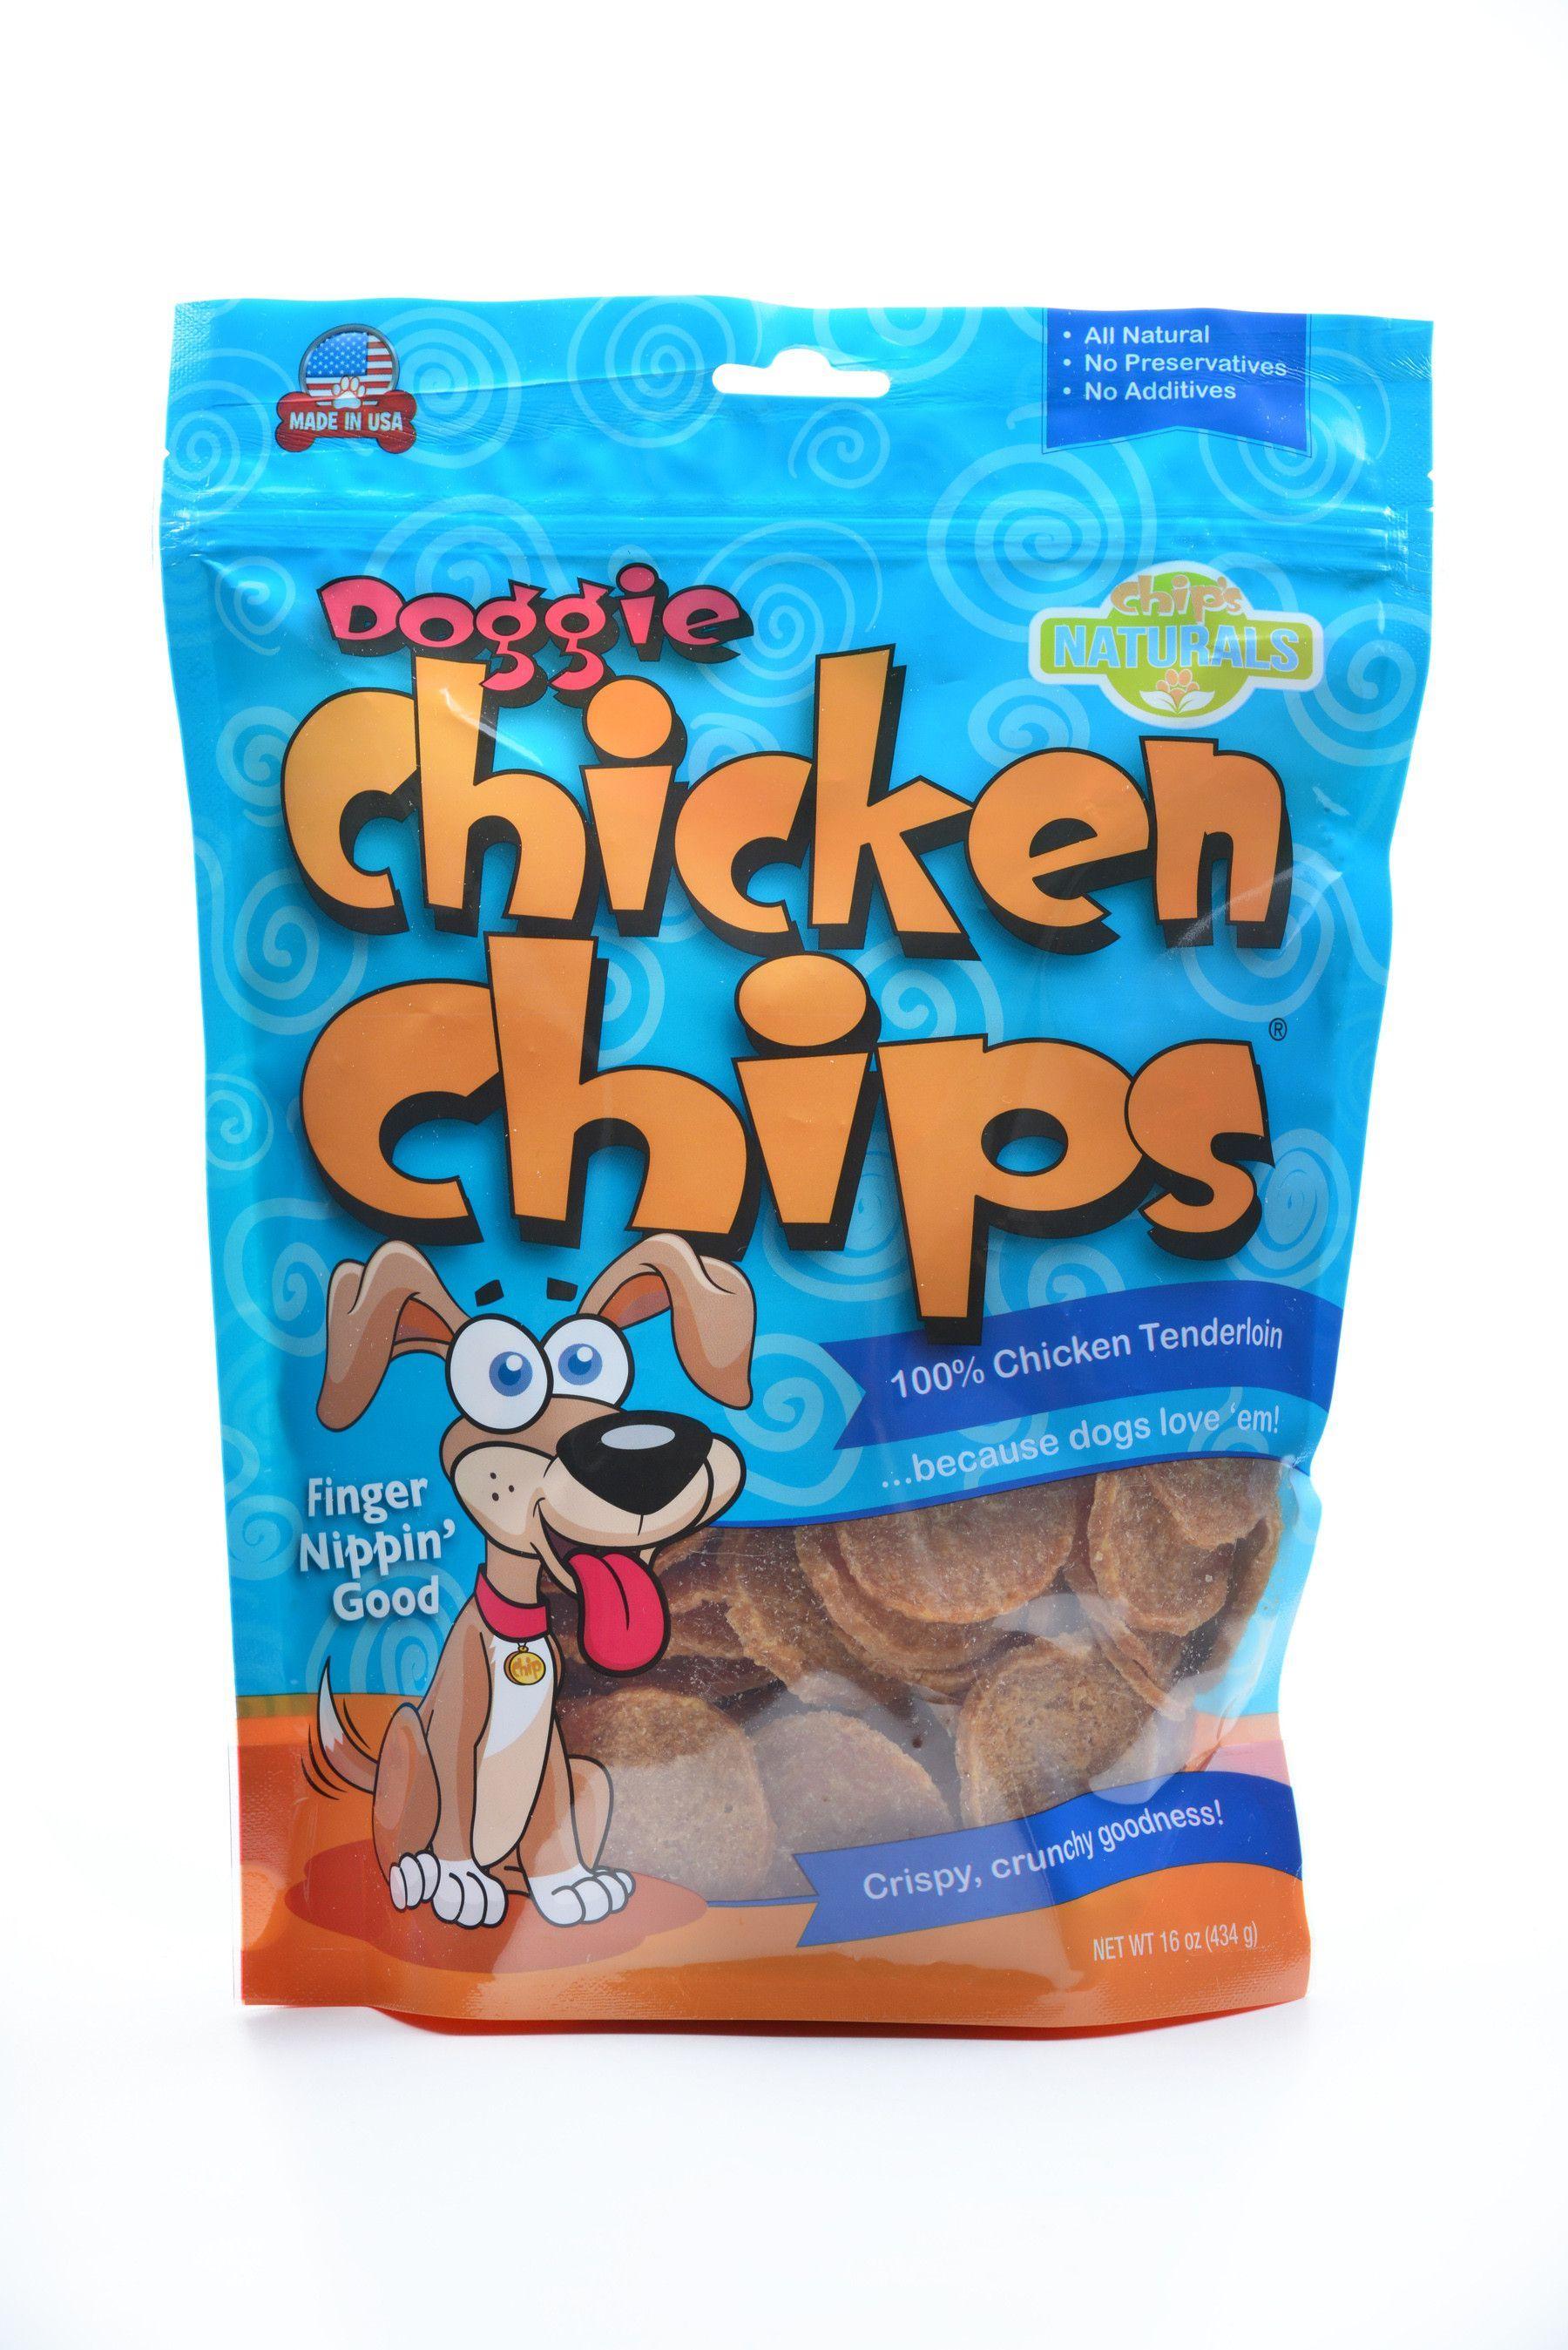 Doggie Chicken Chips Dog Treats Dog Snacks Dog Treats Homemade